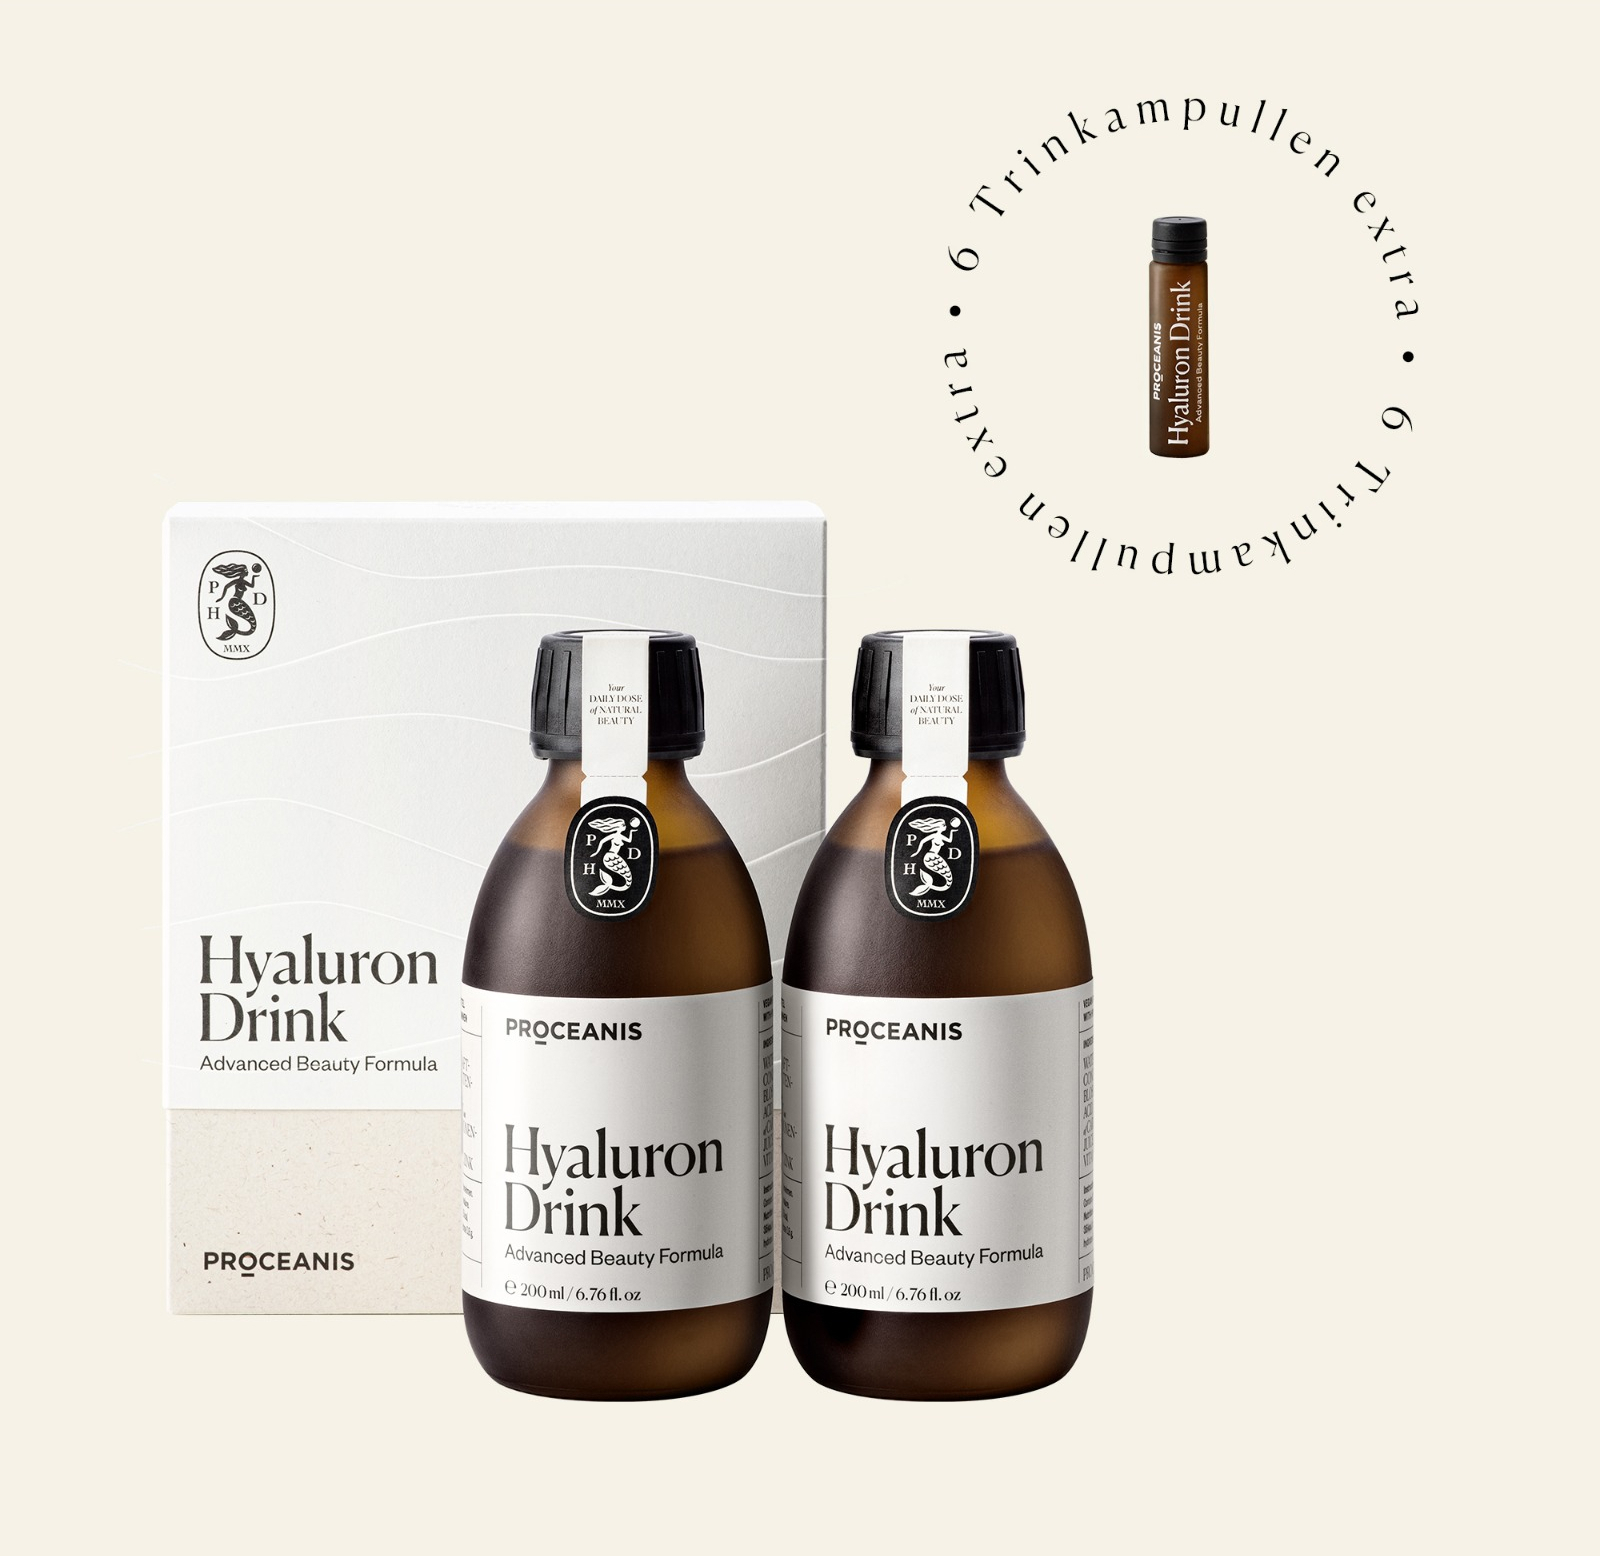 Hyaluron Drink Duo bottle – 6 Trinkampullen extra